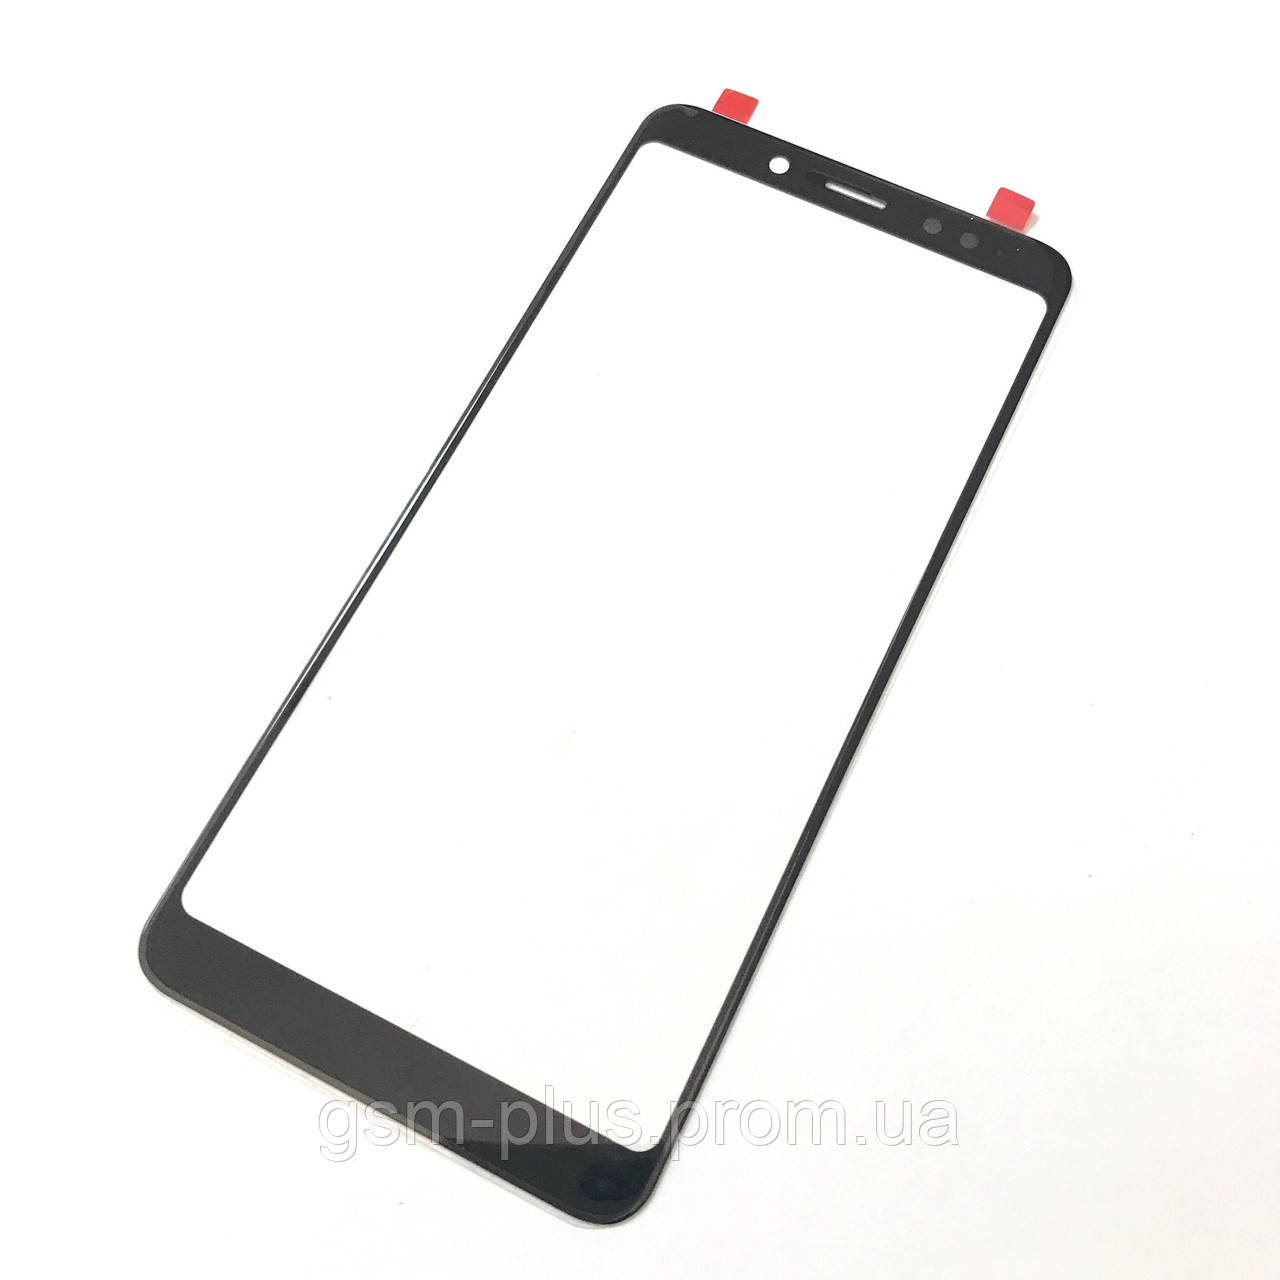 Стекло дисплея Xiaomi Redmi Note 5 / Redmi Note 5 Pro Black (для переклейки)